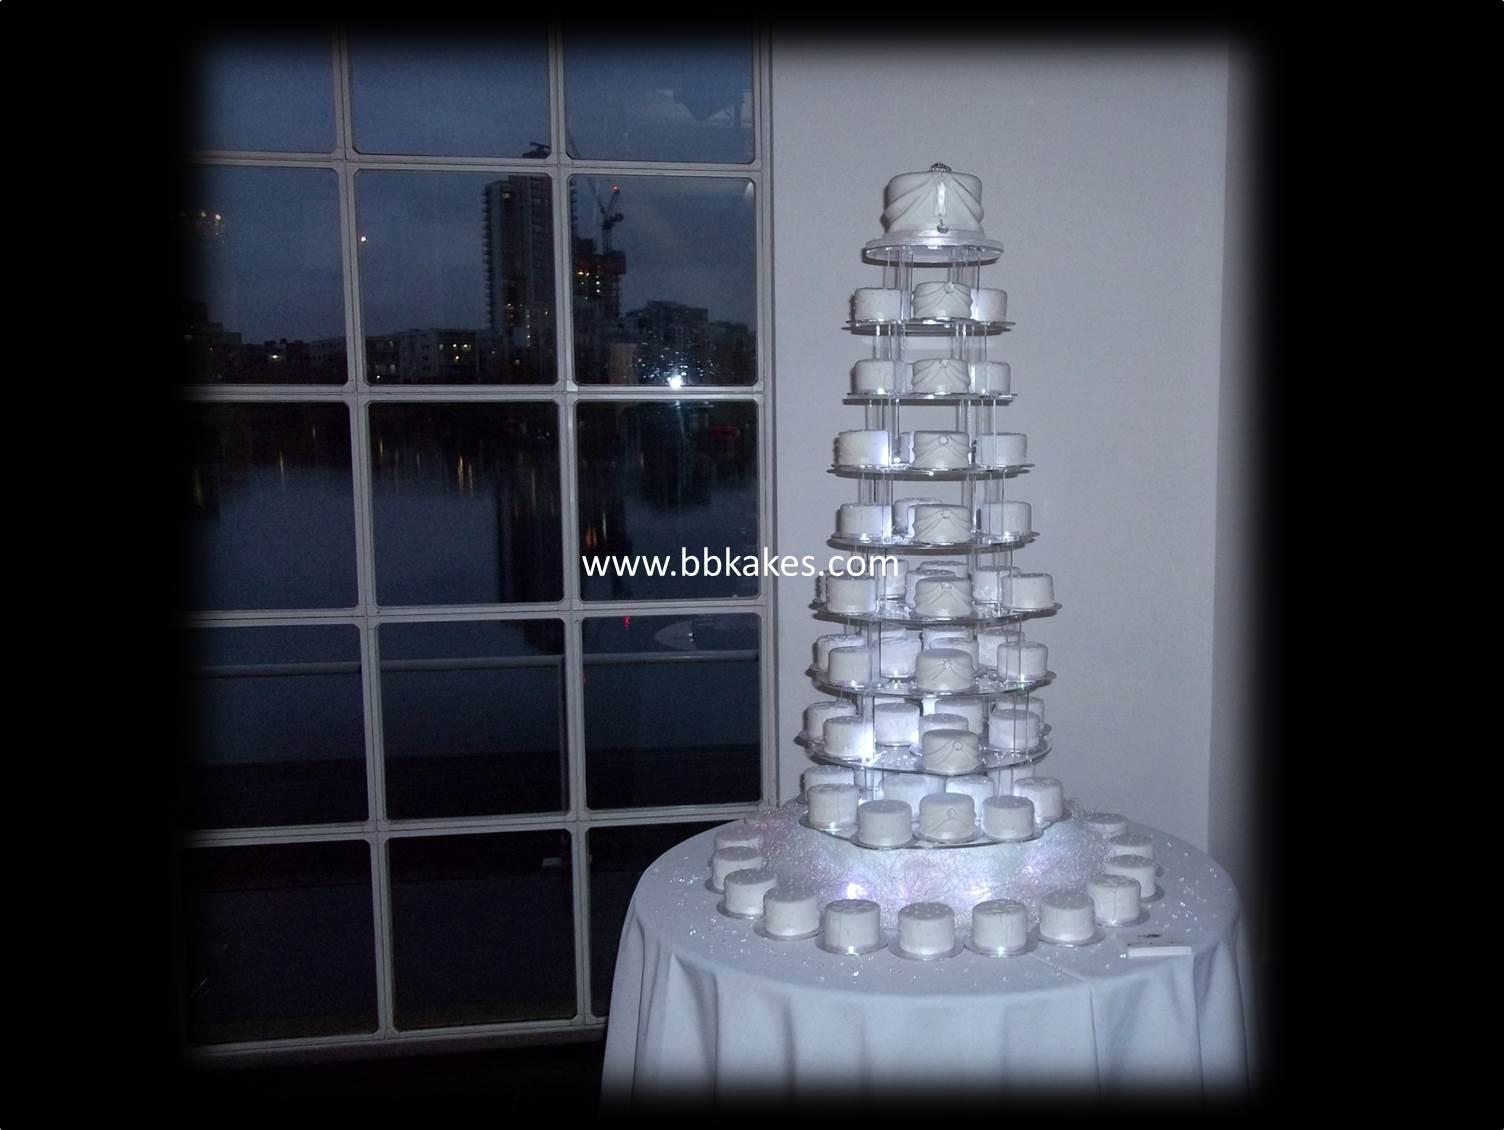 White Winter Wedding Miniature cakes bbkakes 4.jpg